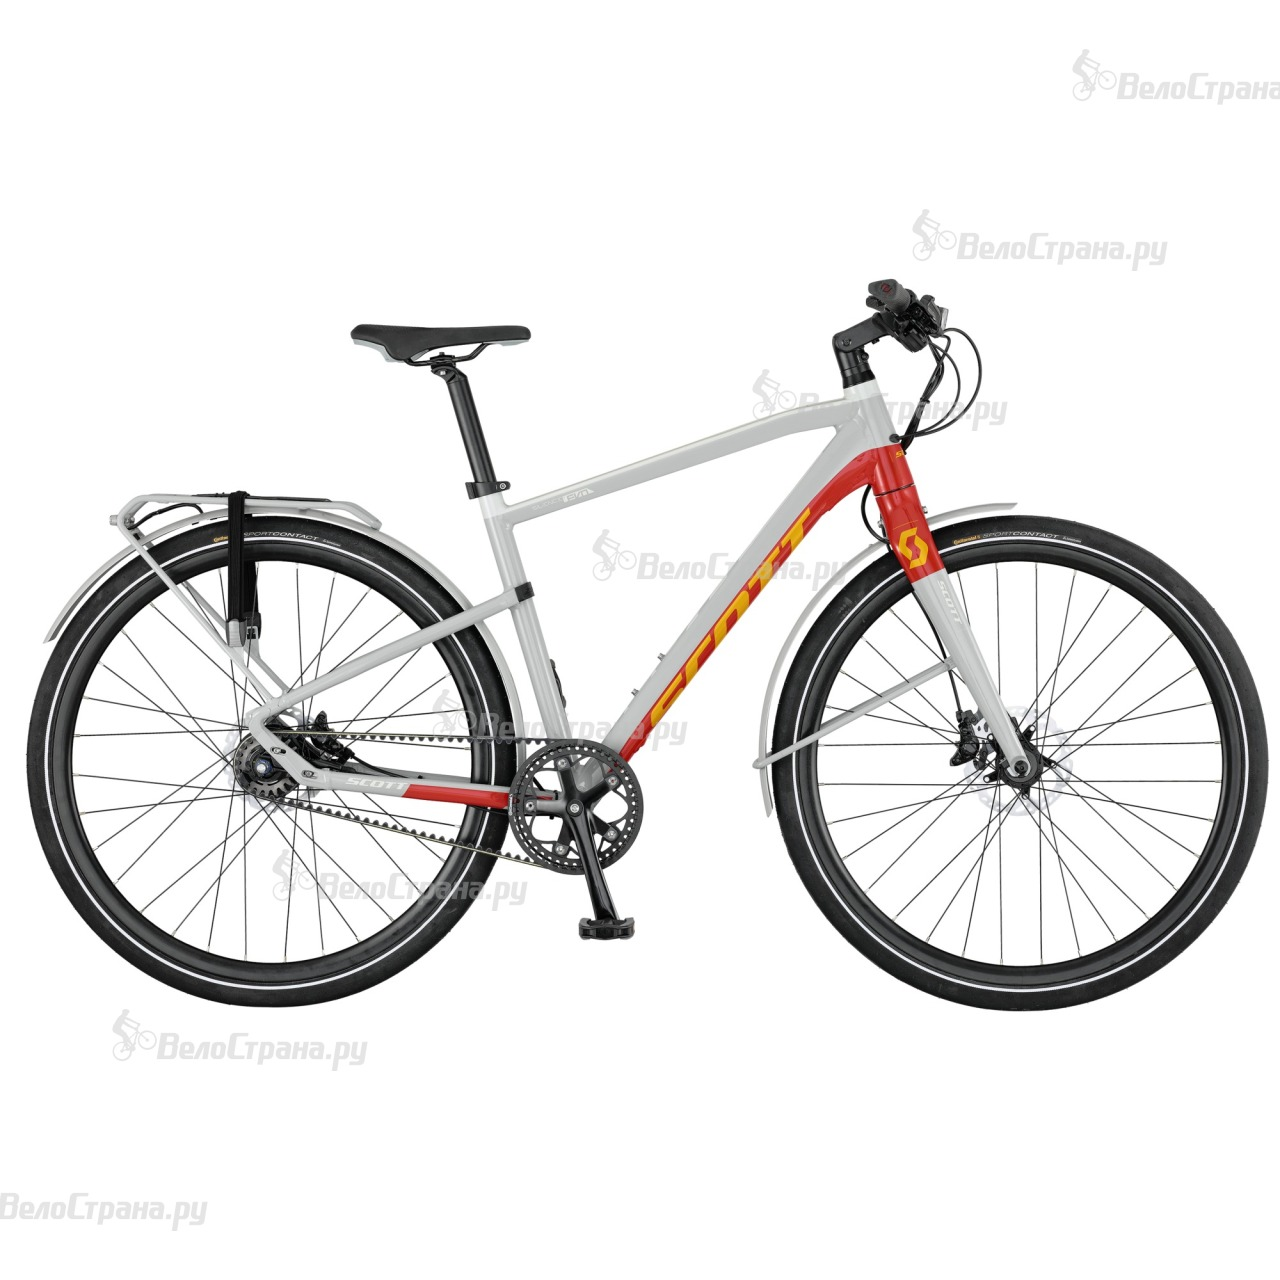 Велосипед Scott Silence Evo (2017) велосипед scott e silence speed 20 2017